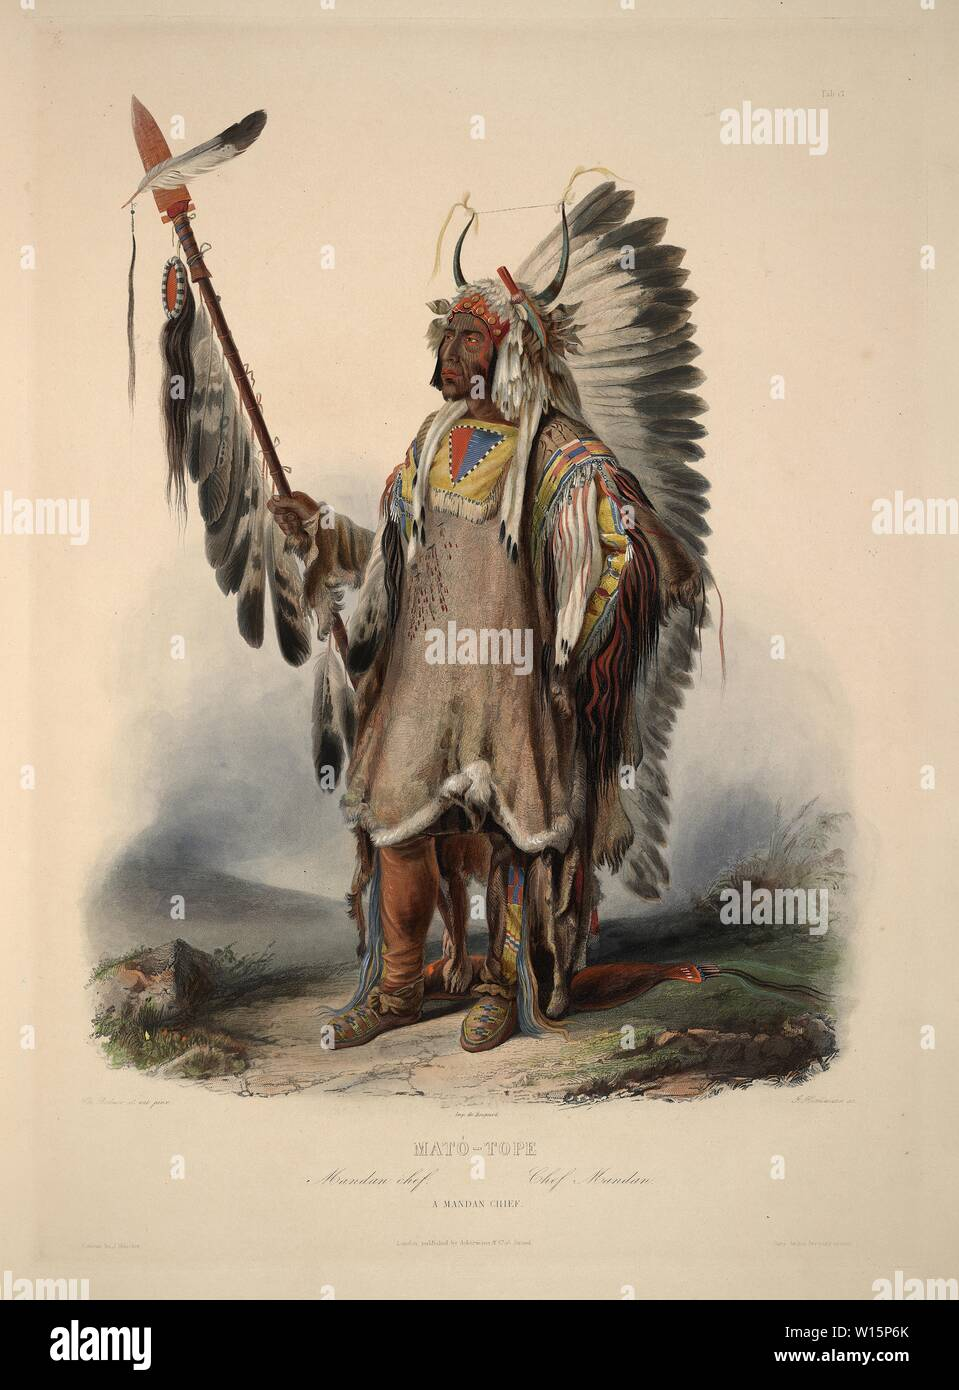 Mató-Tope, a Mandan chief - Karl Bodmer aquatint from Travels in the Interior of North America (Voyage dans l'intérieur de l'Amérique du Nord) Stock Photo